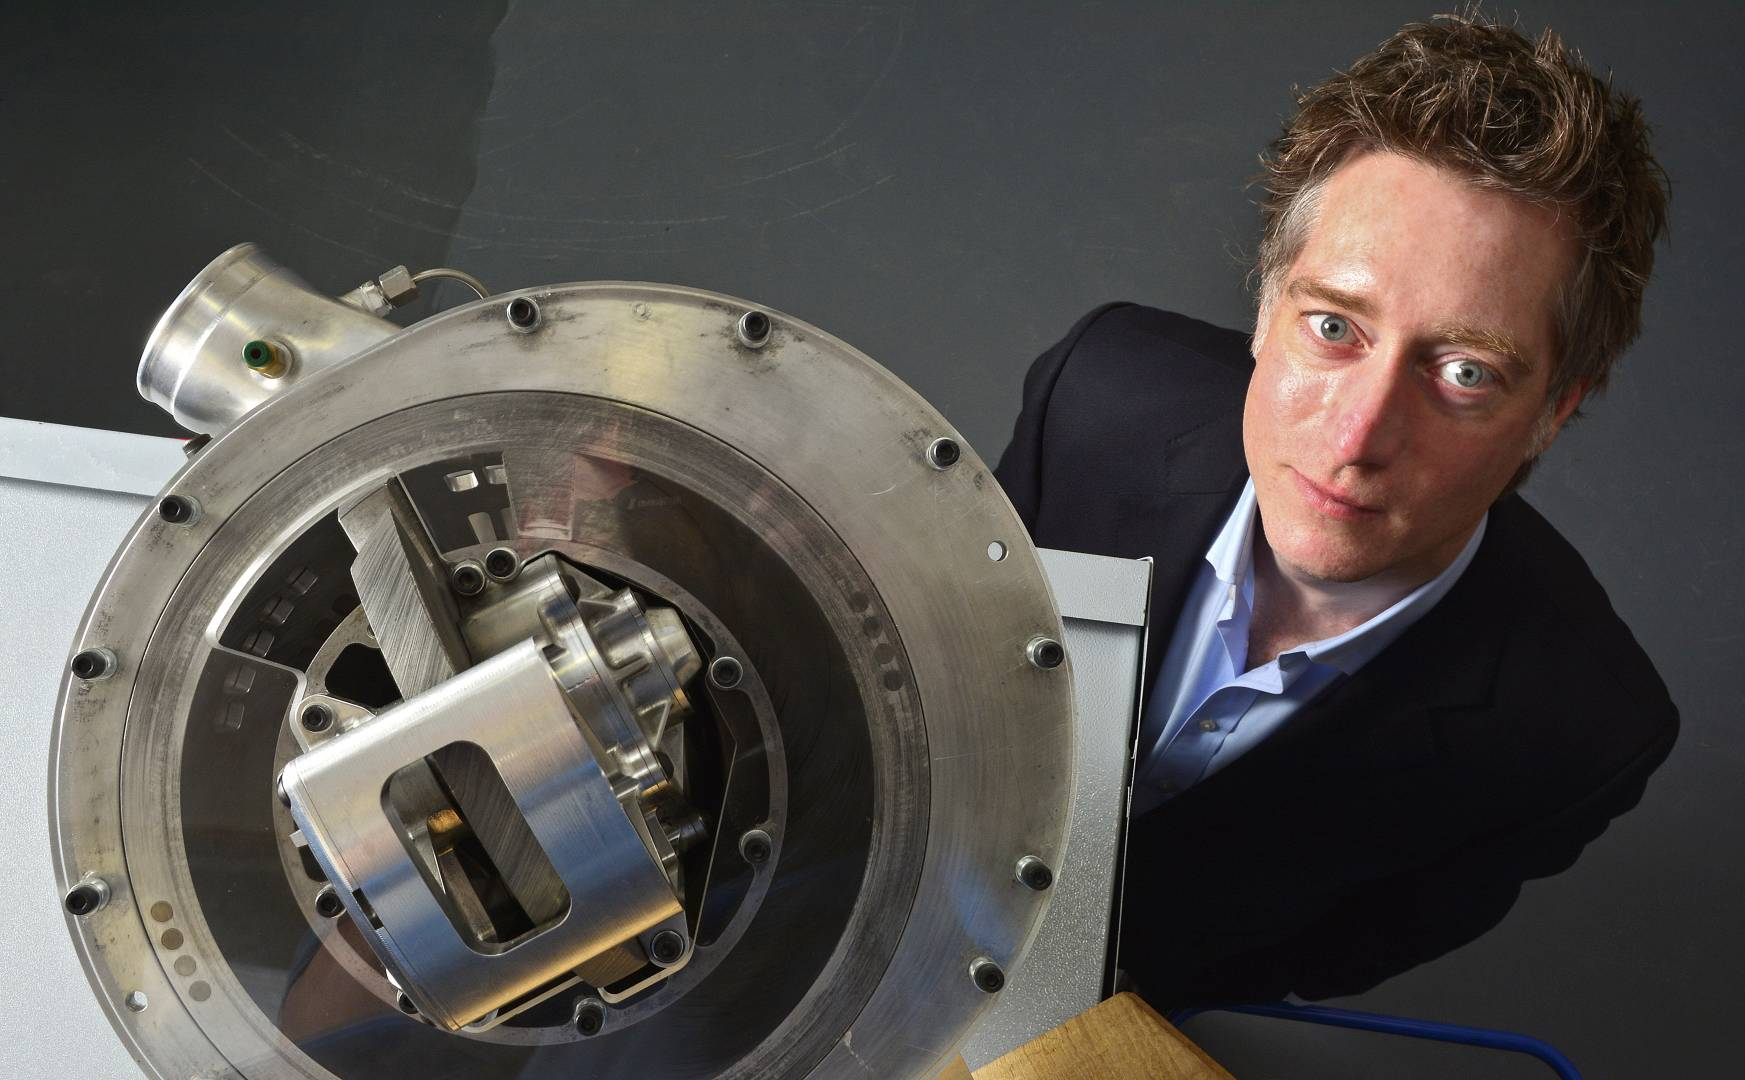 Steve Lindsey, founder, CEO and designer of the Blade Compressor, Lontra.